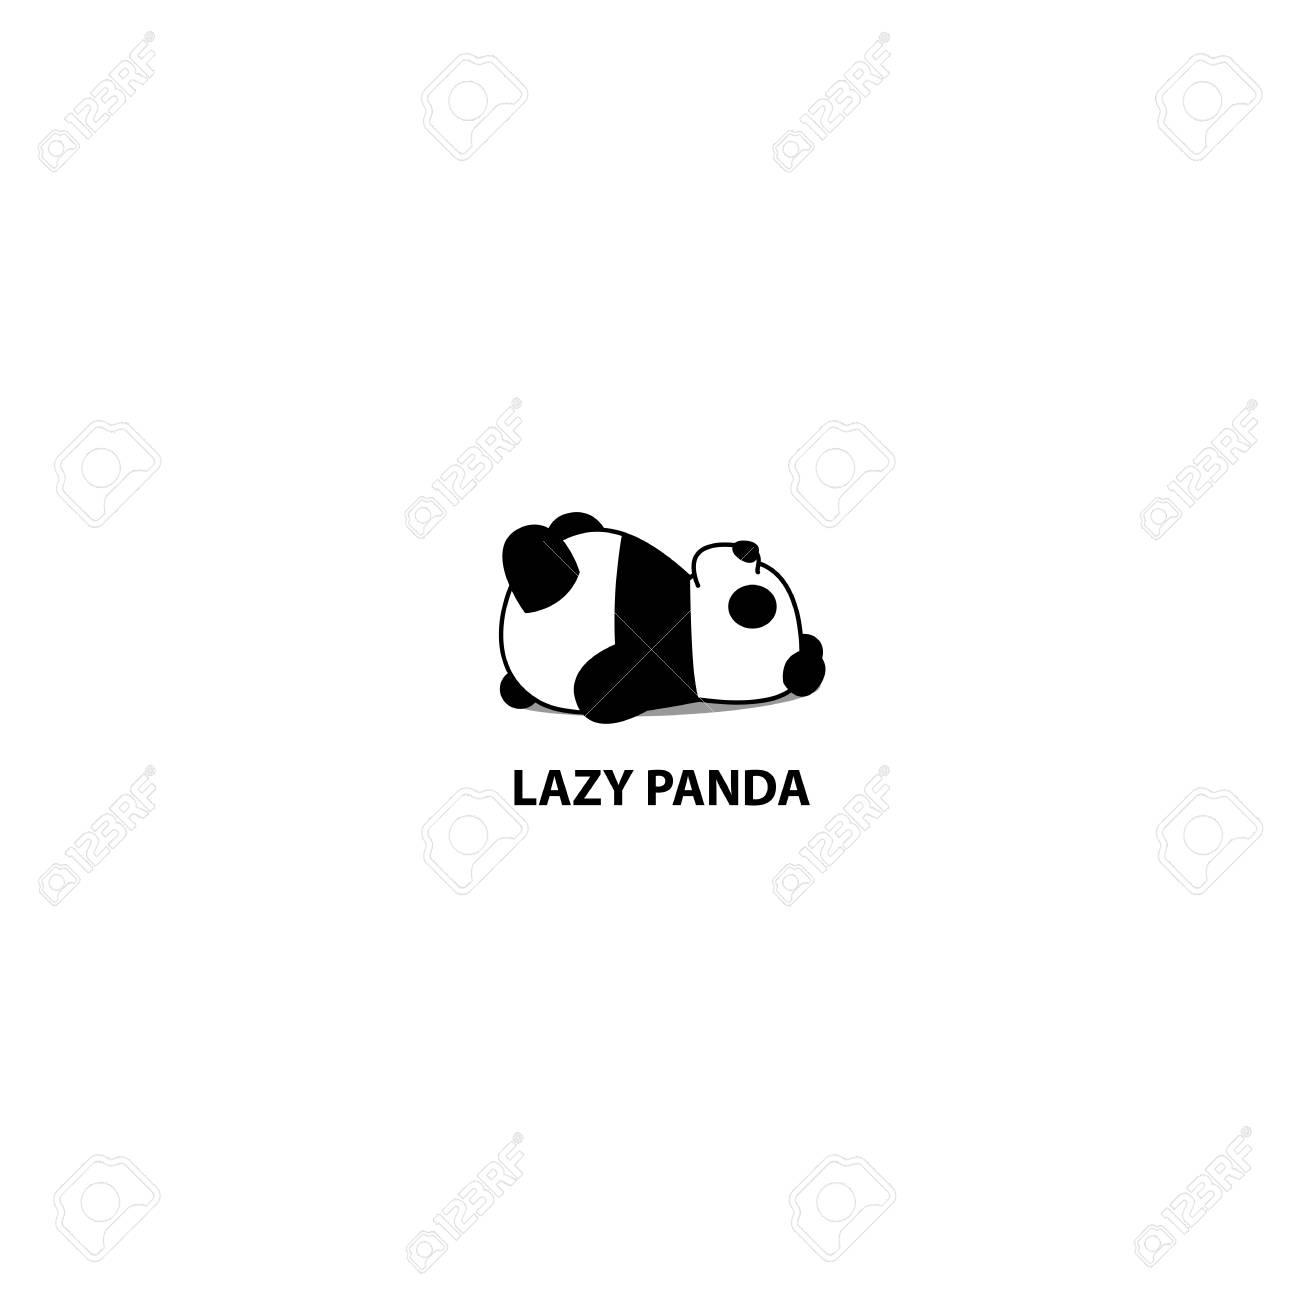 Lazy panda sleeping icon, logo design, vector illustration - 104201097